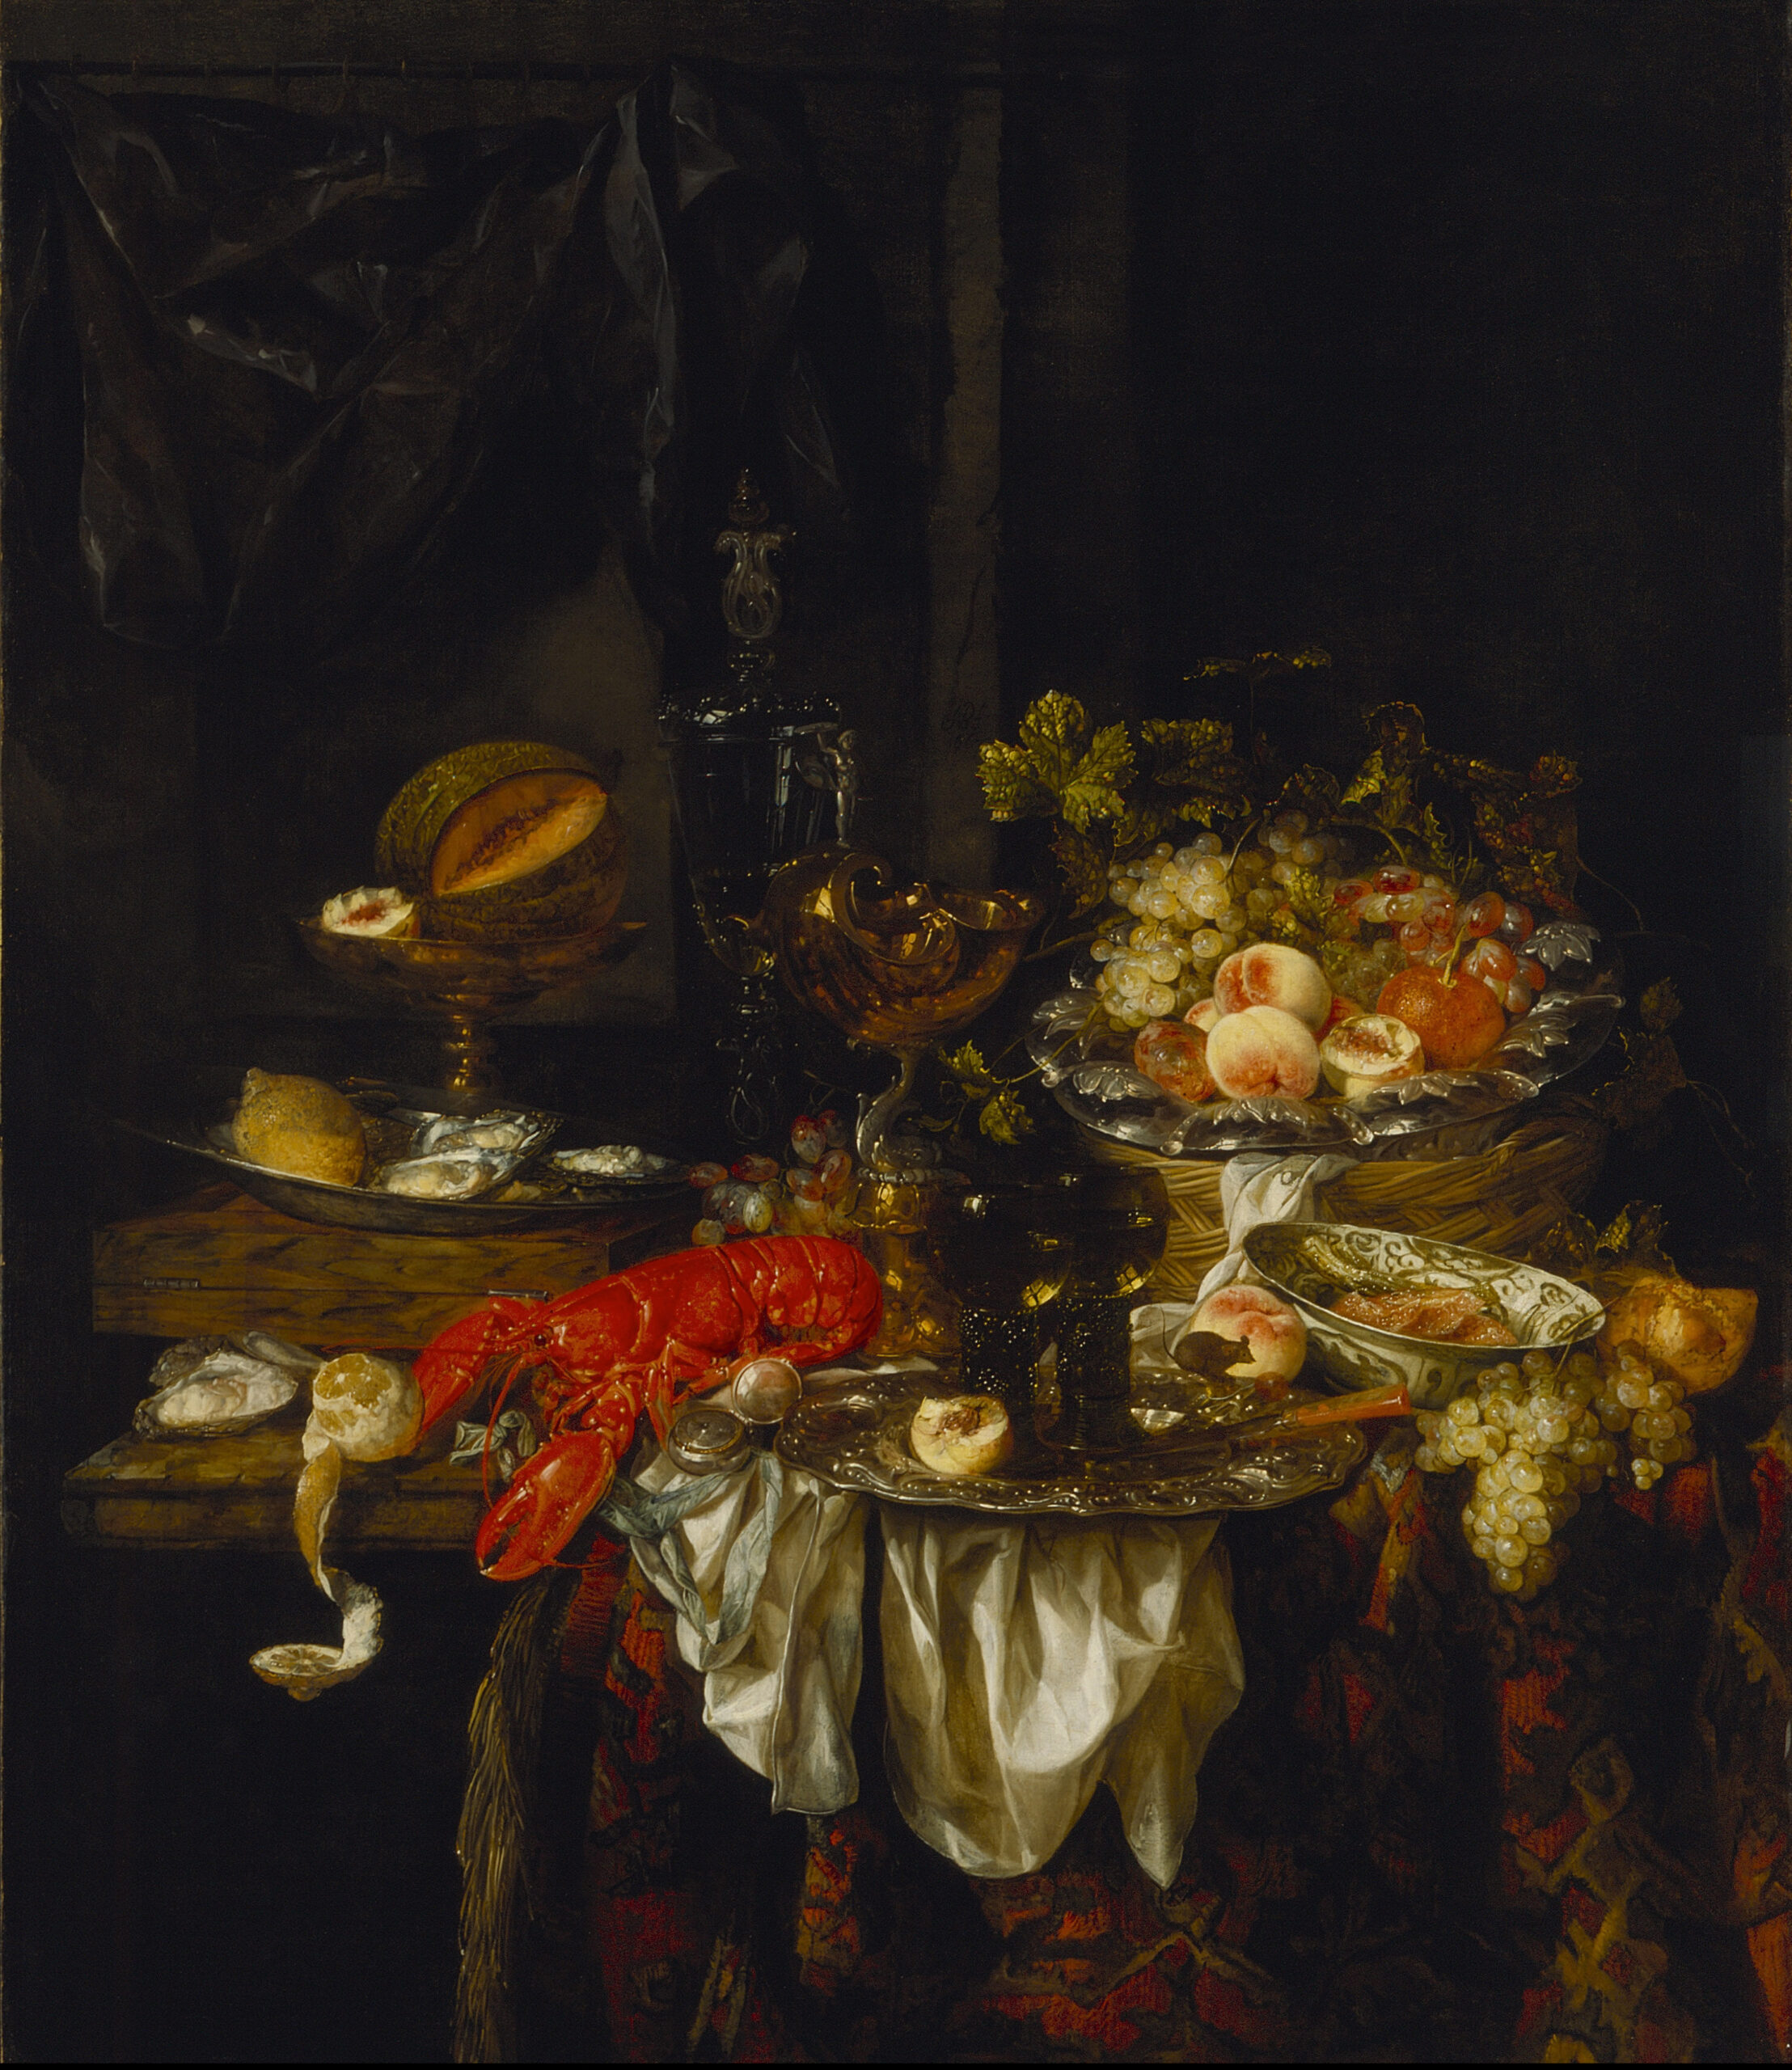 Abraham van Beyeren (1620/21-1691), <em>Banquet Still Life</em>, 1667<br>LACMA, Los Angeless